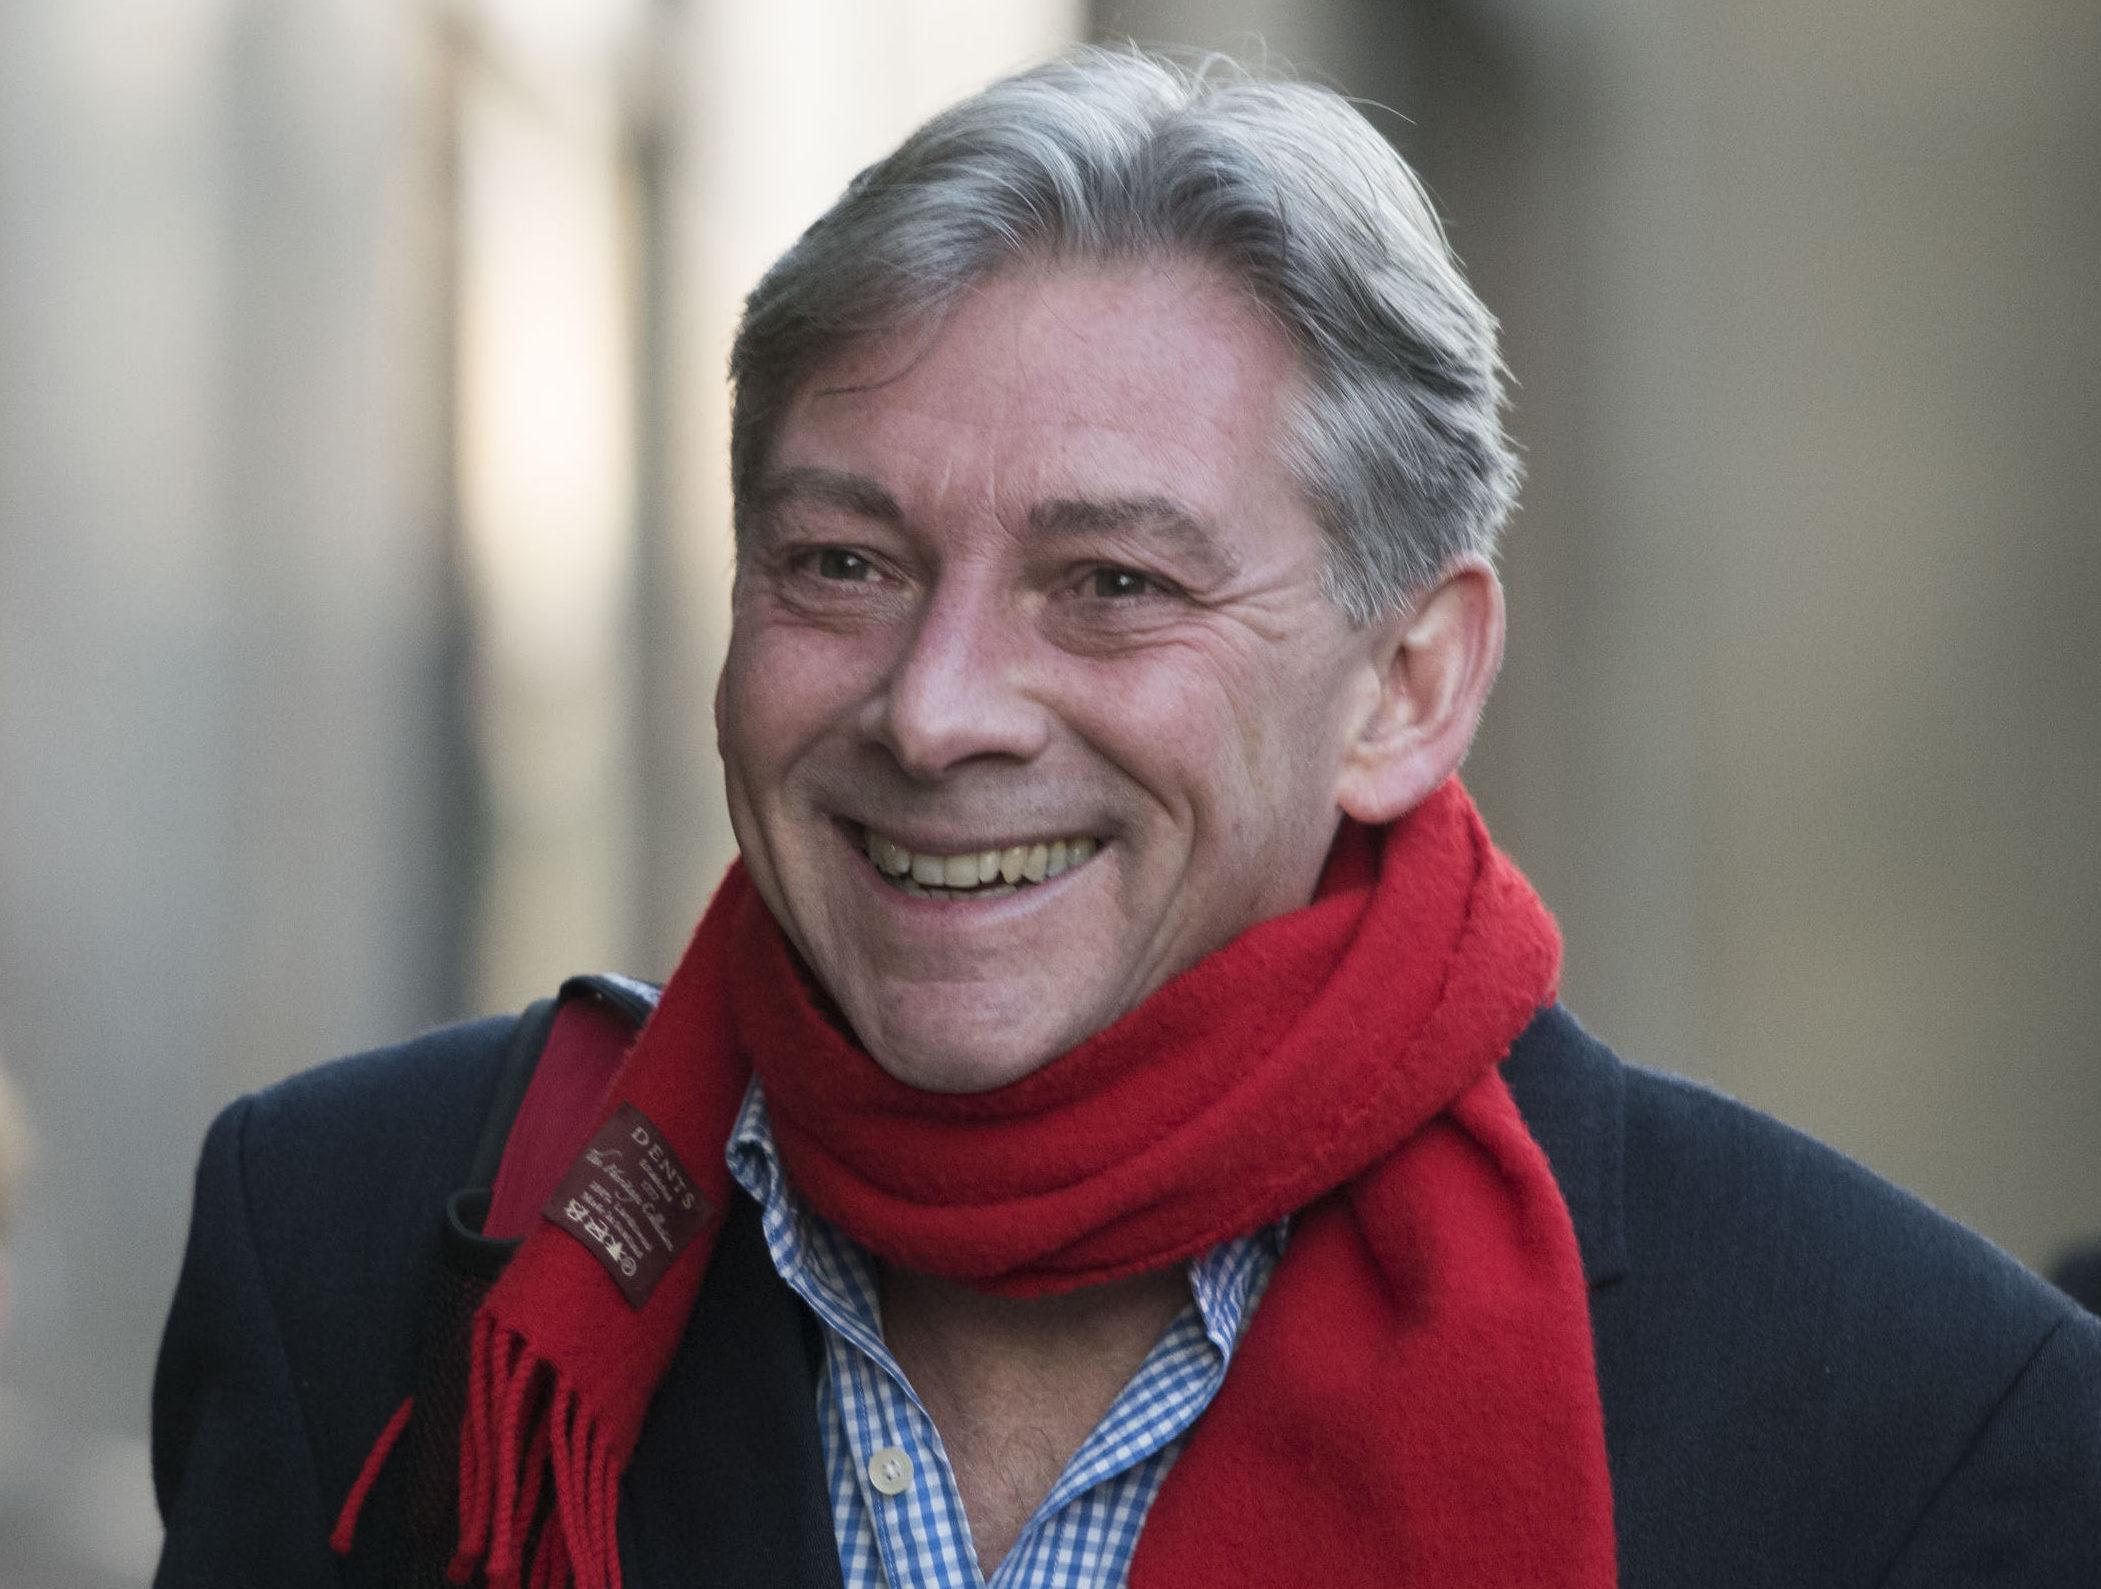 Scottish Labour leader Richard Leonard (John Linton/PA Wire)